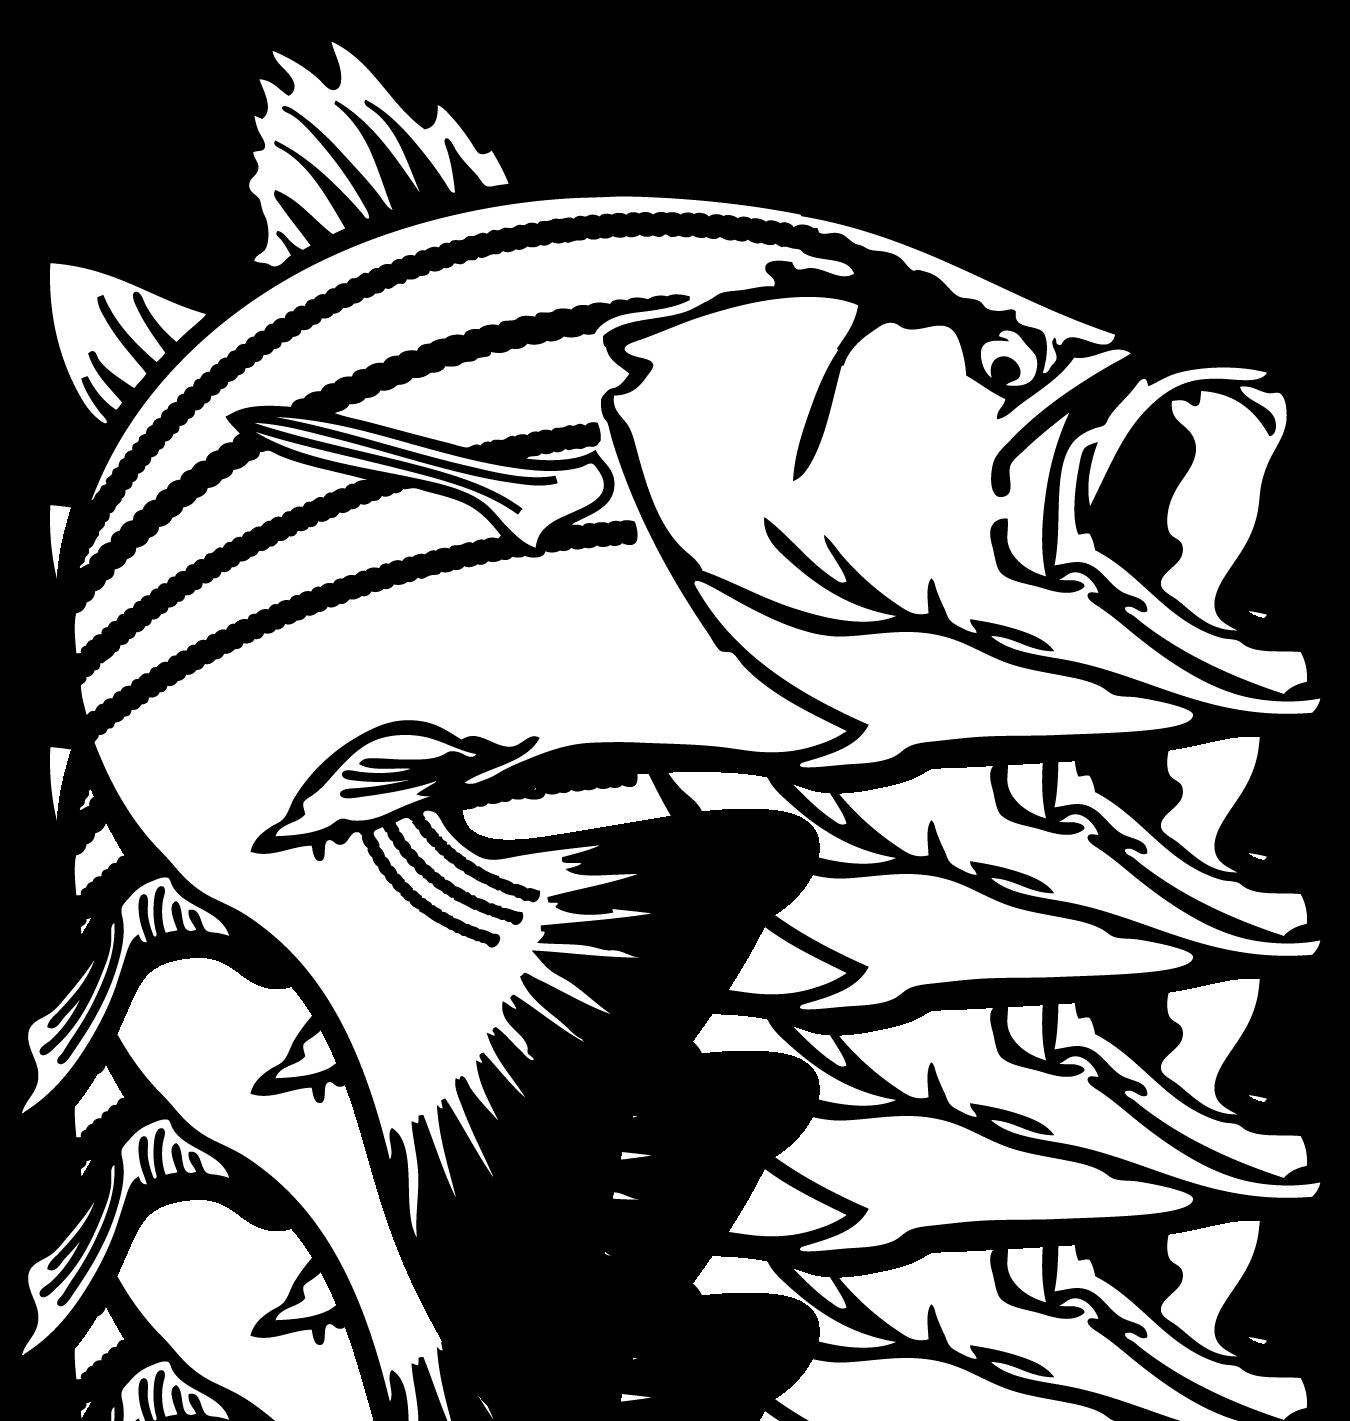 1350x1421 Exploit Clip Art Fish Black Silhouette Free